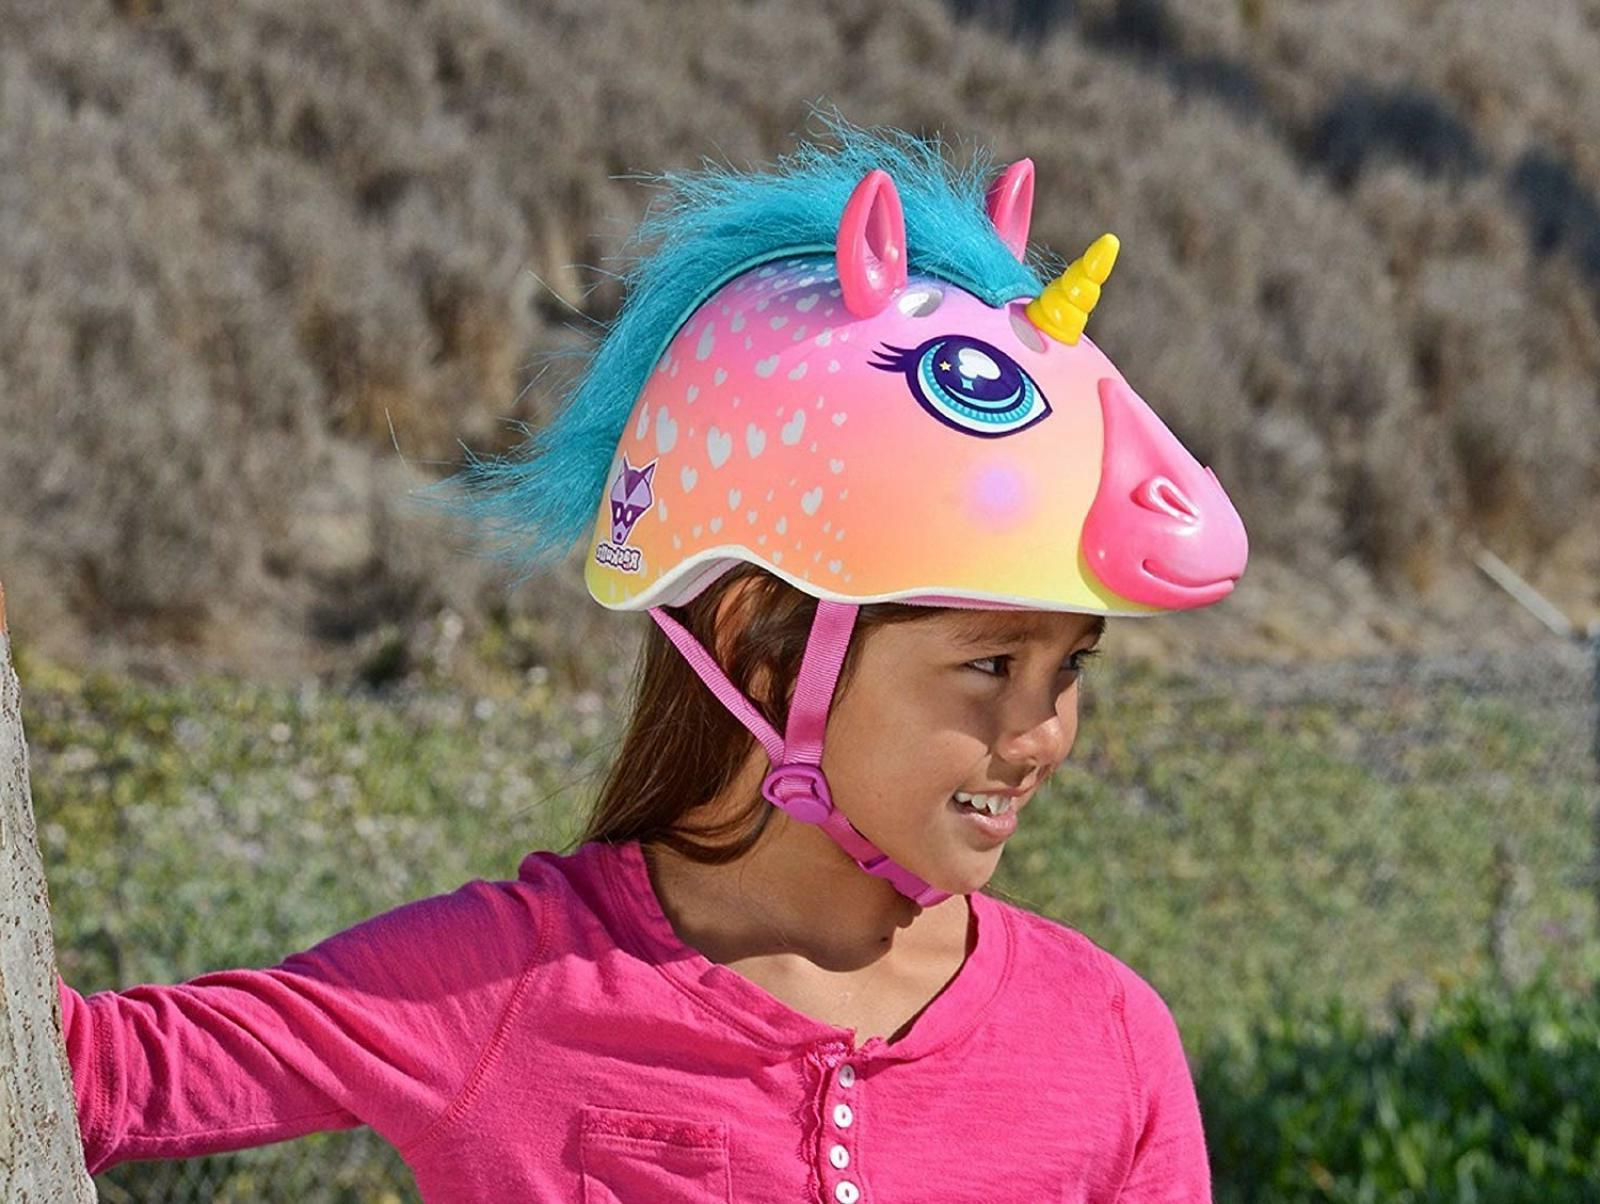 Raskullz Unicorn Kid Bike Helmet 3D Safety Bicycle Sports Scooter Skating Gift